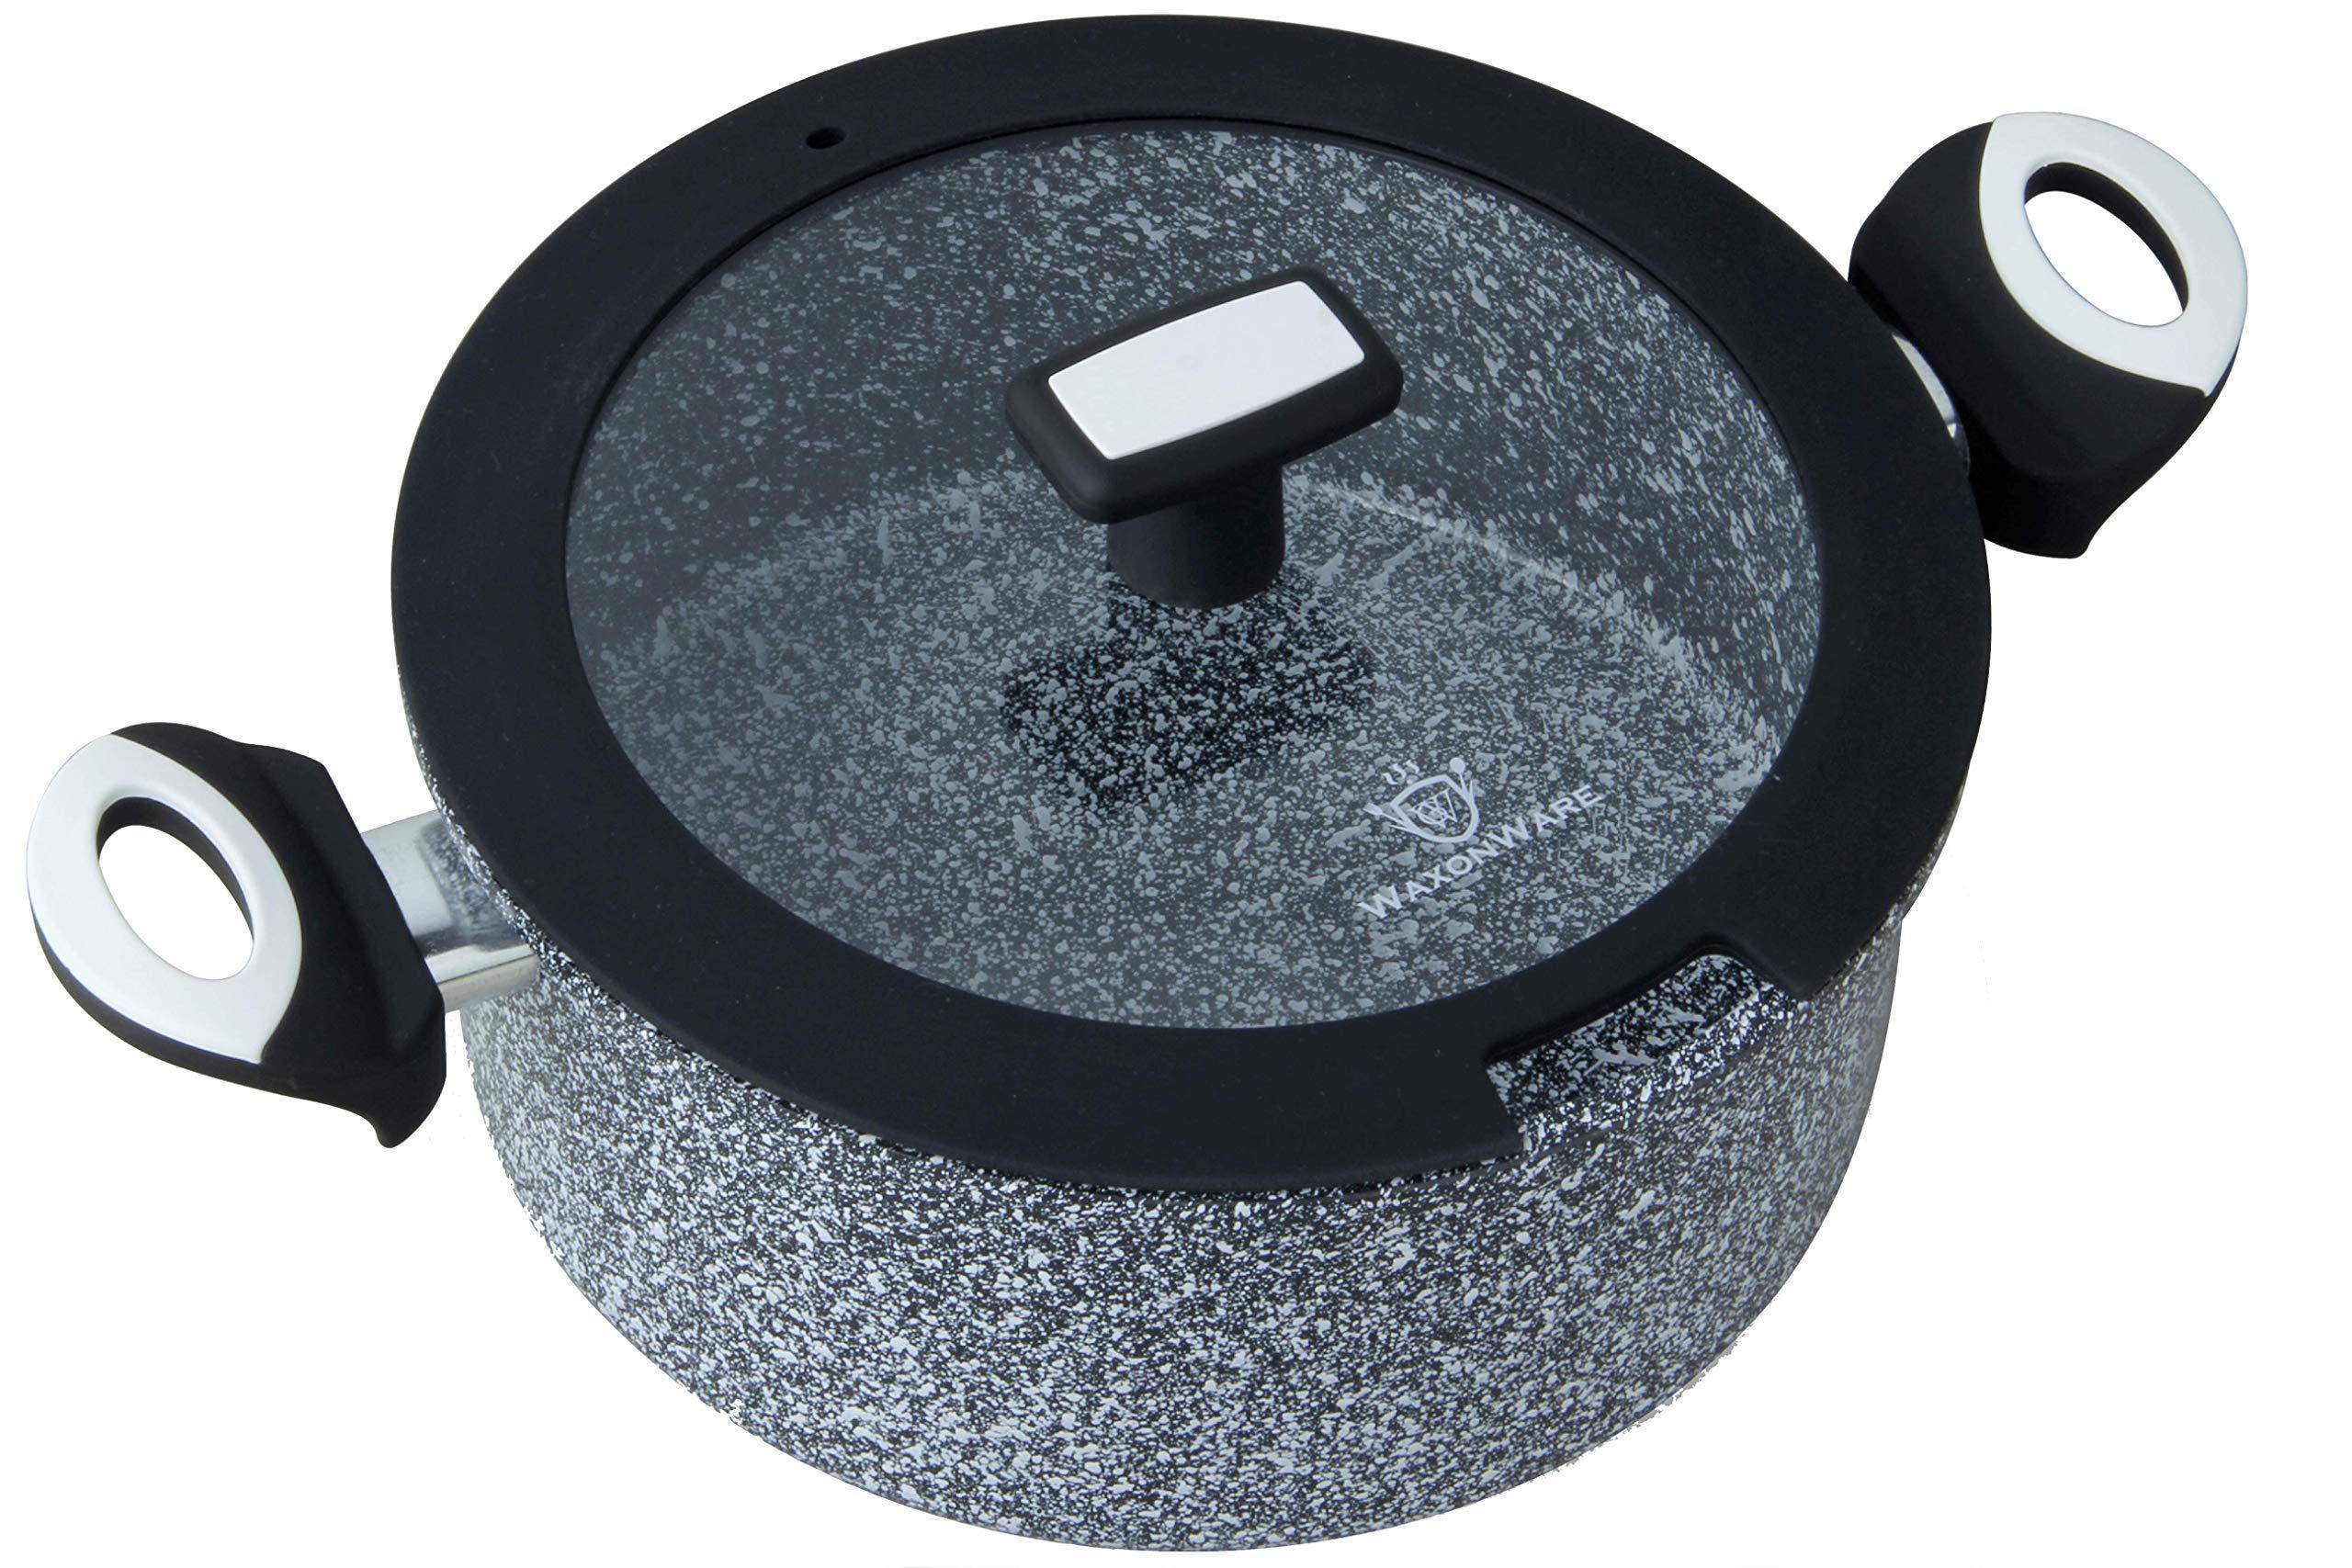 WaxonWare 5.25 Quart Ceramic Nonstick Dutch Oven Casserole Stockpot, Anti-Warp Non Toxic PTFE APEO PFOA Free Nonstick Pot With Lid, Induction Compatible, Dishwasher Safe Dutch Oven (STONETEC Series)